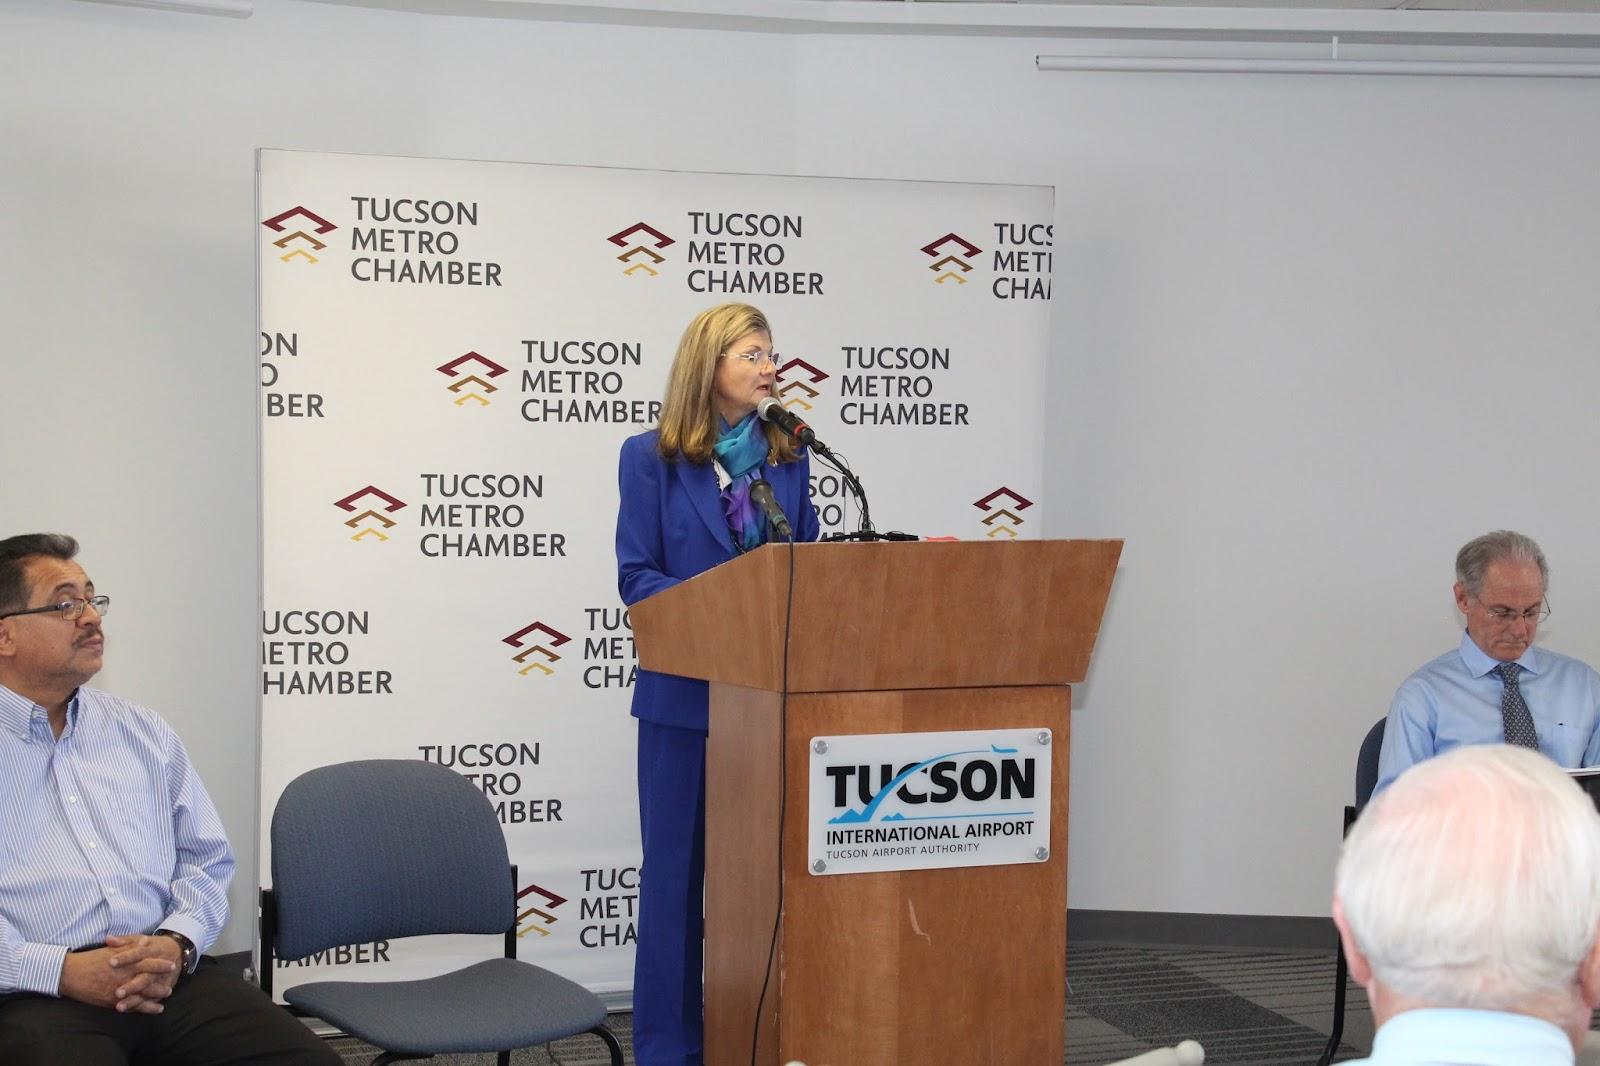 Tucson - JFK Non-Stop Route Announcement - IMG_3153.JPG